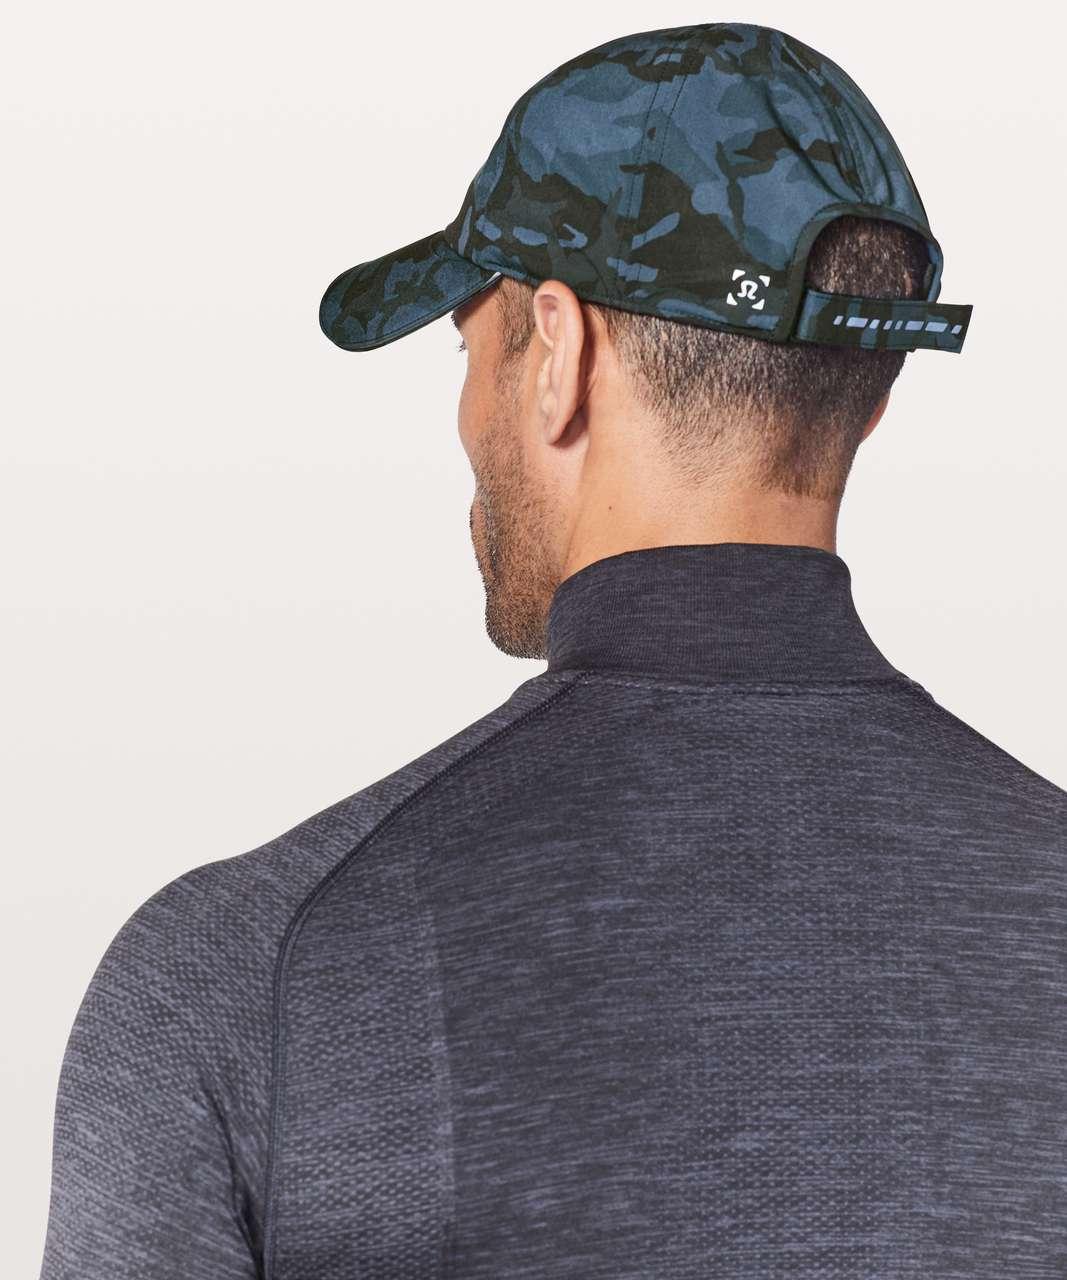 Lululemon Lightspeed Run Hat - Incognito Camo Blue Multi